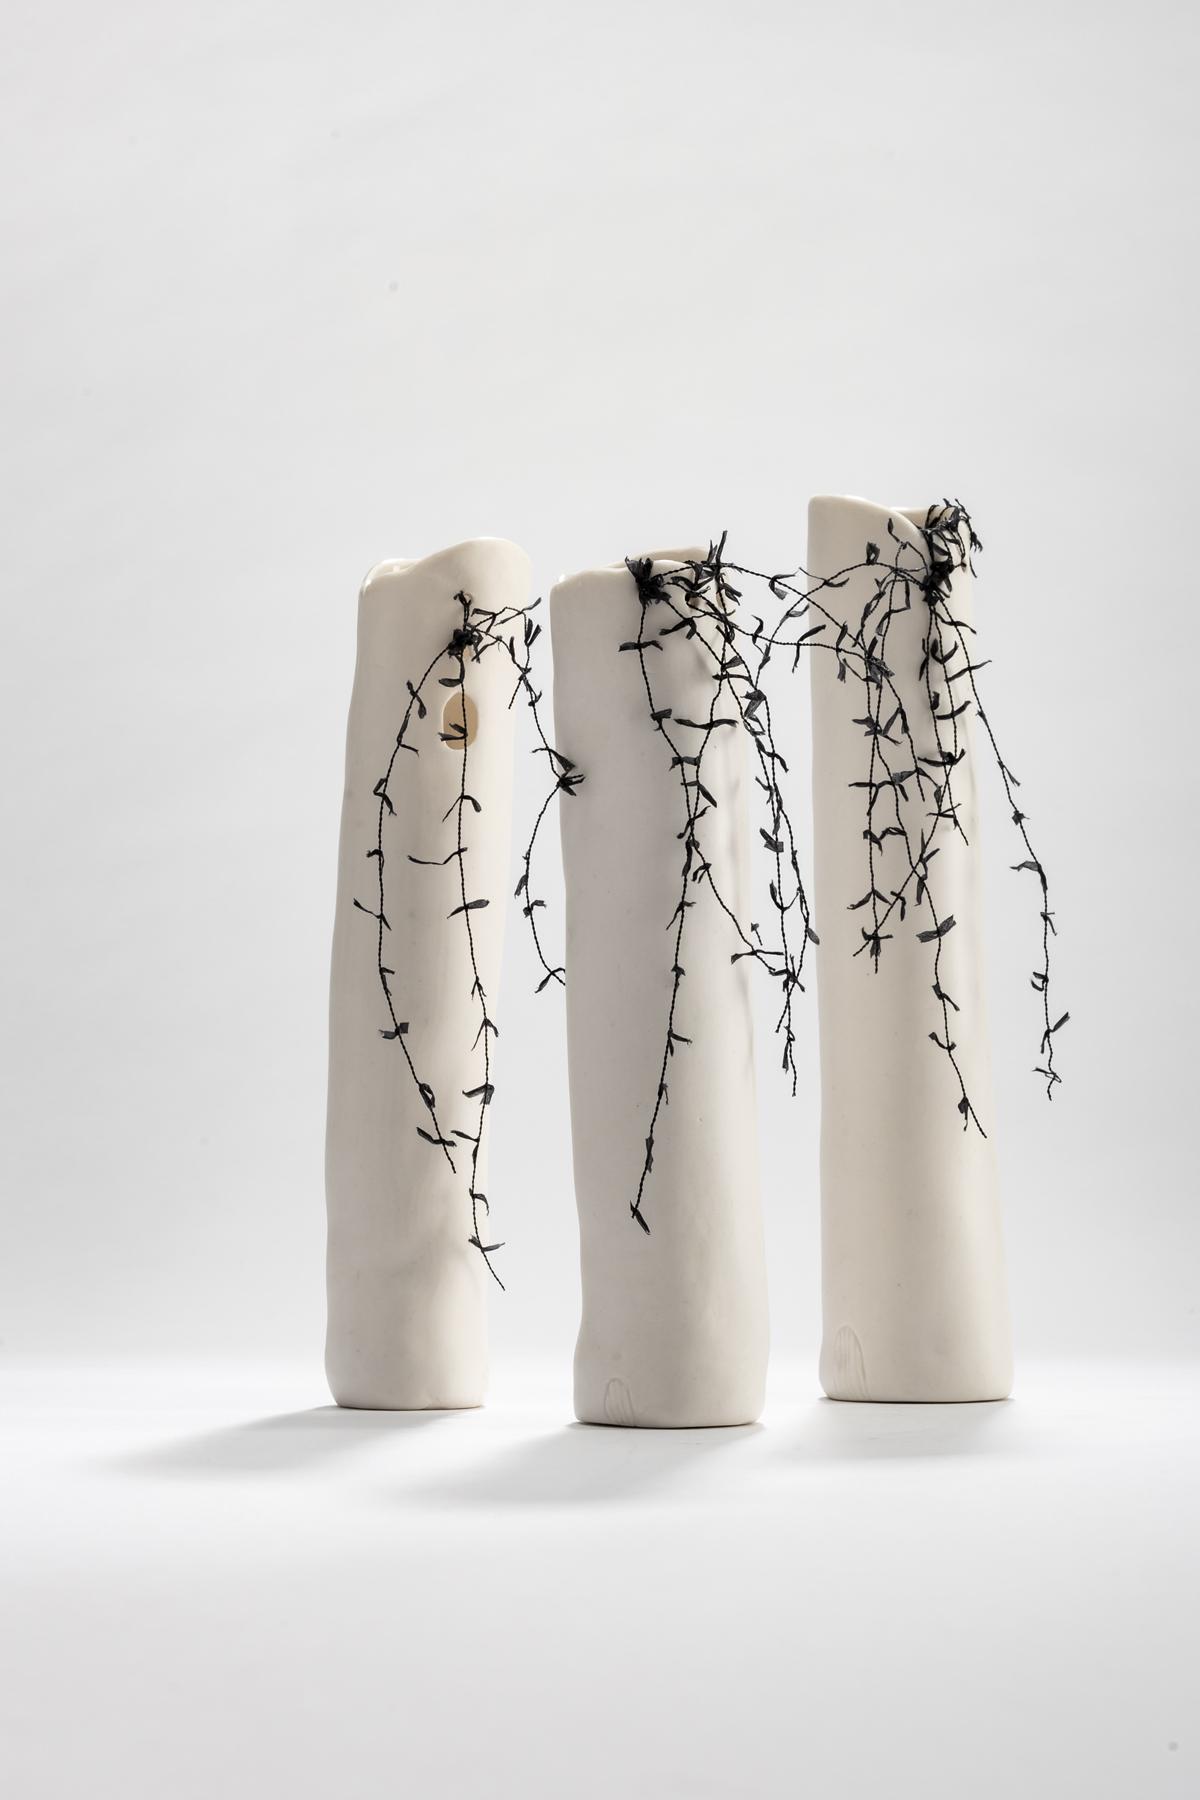 Tracy Dickason  'Threaded Bud vases' $160 | $🔴 | $170